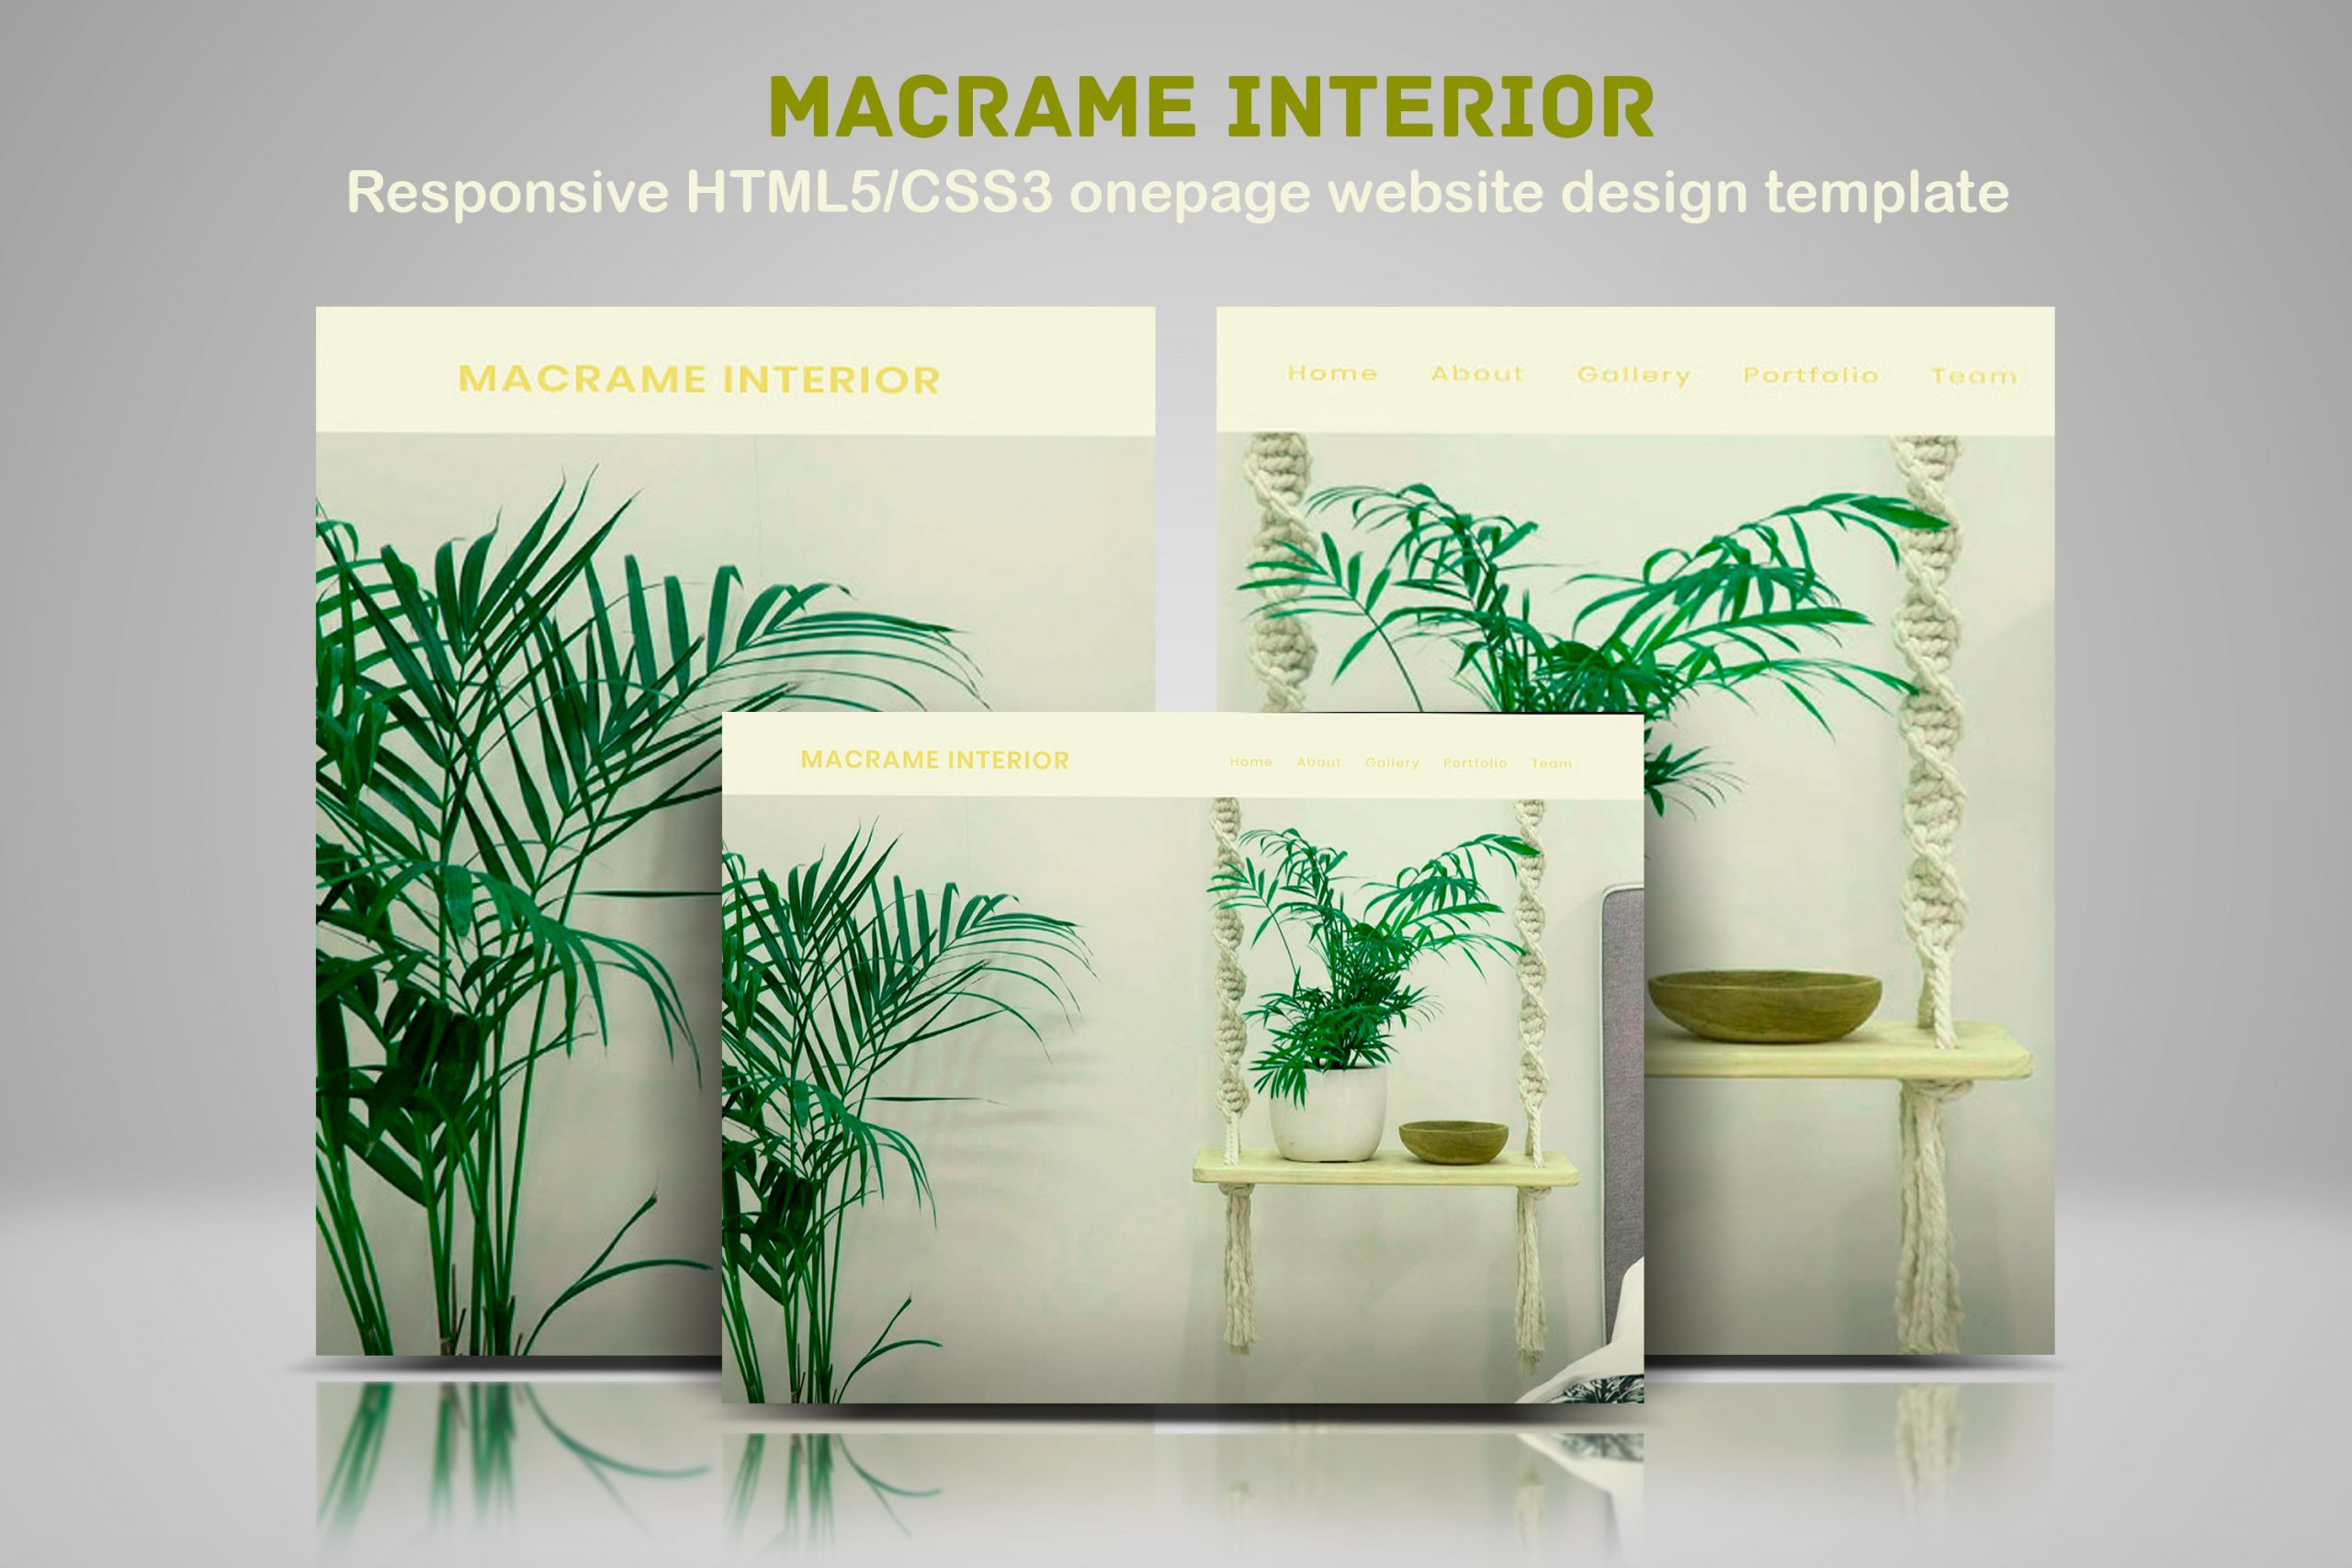 macrame-interior-Responsive-HTML5-CSS3-onepage-website-design-template-ayatemplates